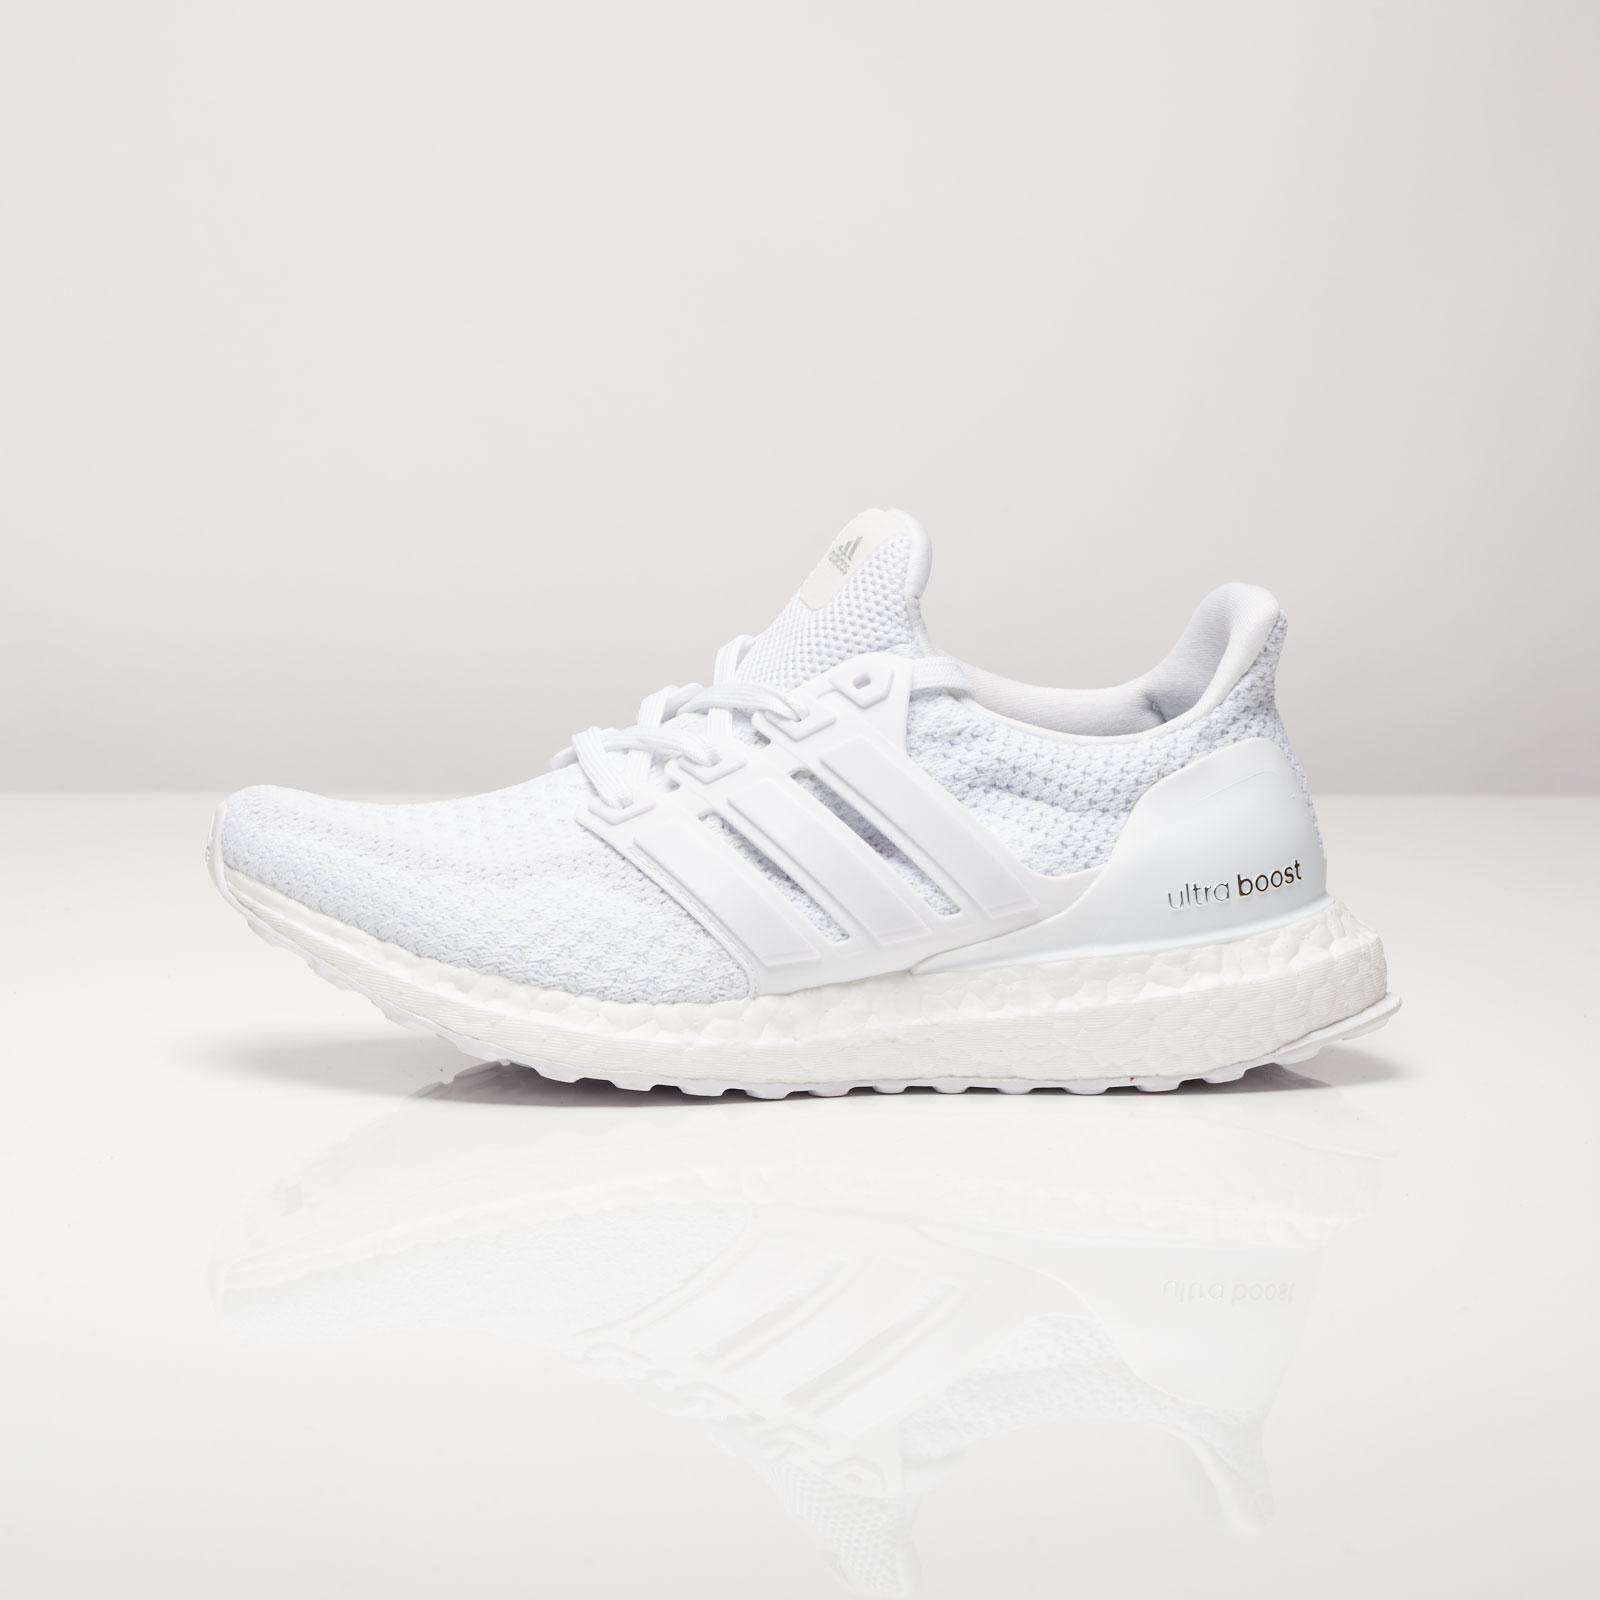 beb3569e7e573 adidas Ultra Boost W - Aq5934 - Sneakersnstuff